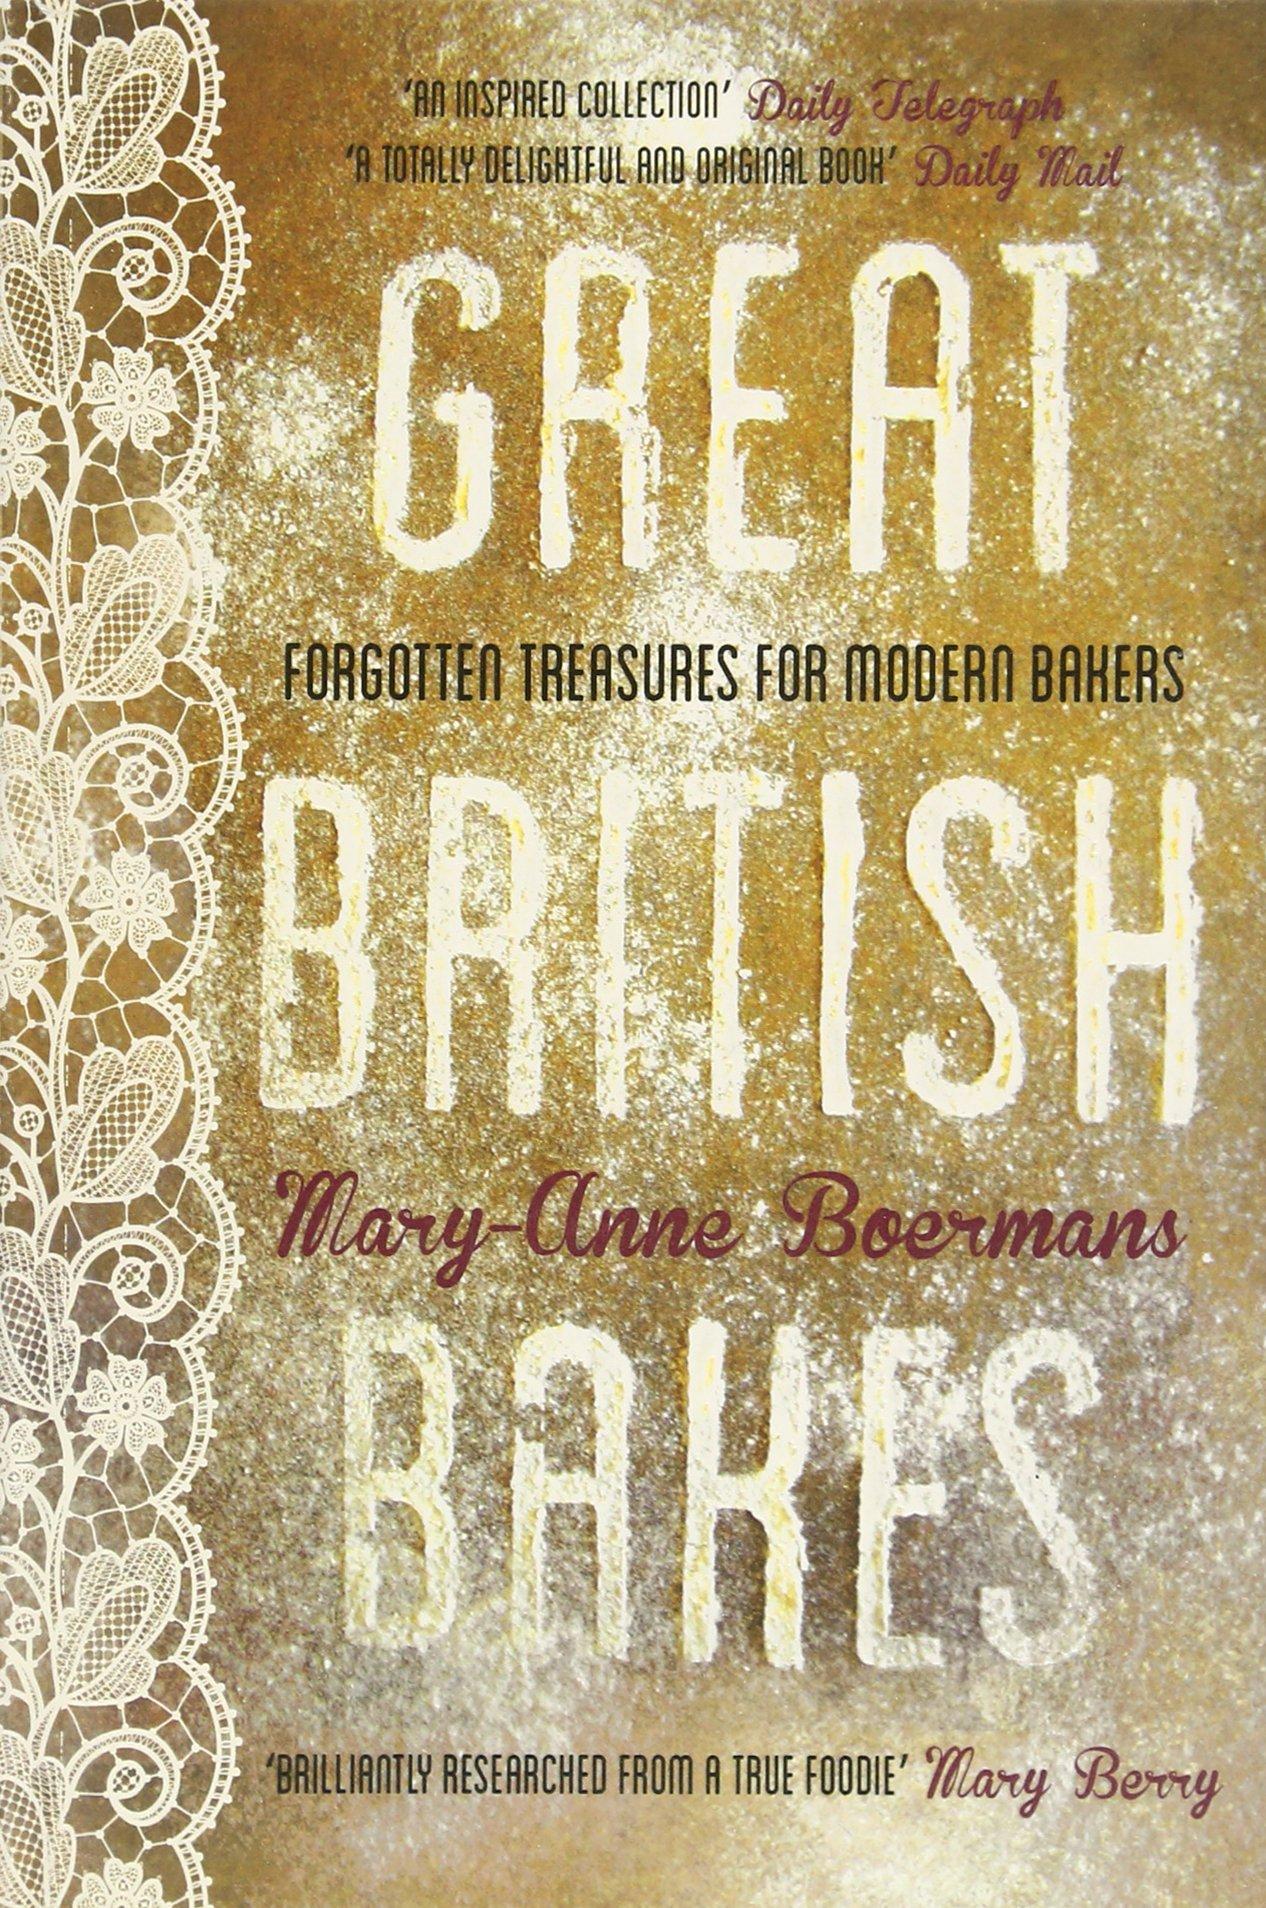 Great British Bakes: Forgotten Treasures For Modern Bakers: Amazon:  Maryanne Boermans: 8601404330957: Books